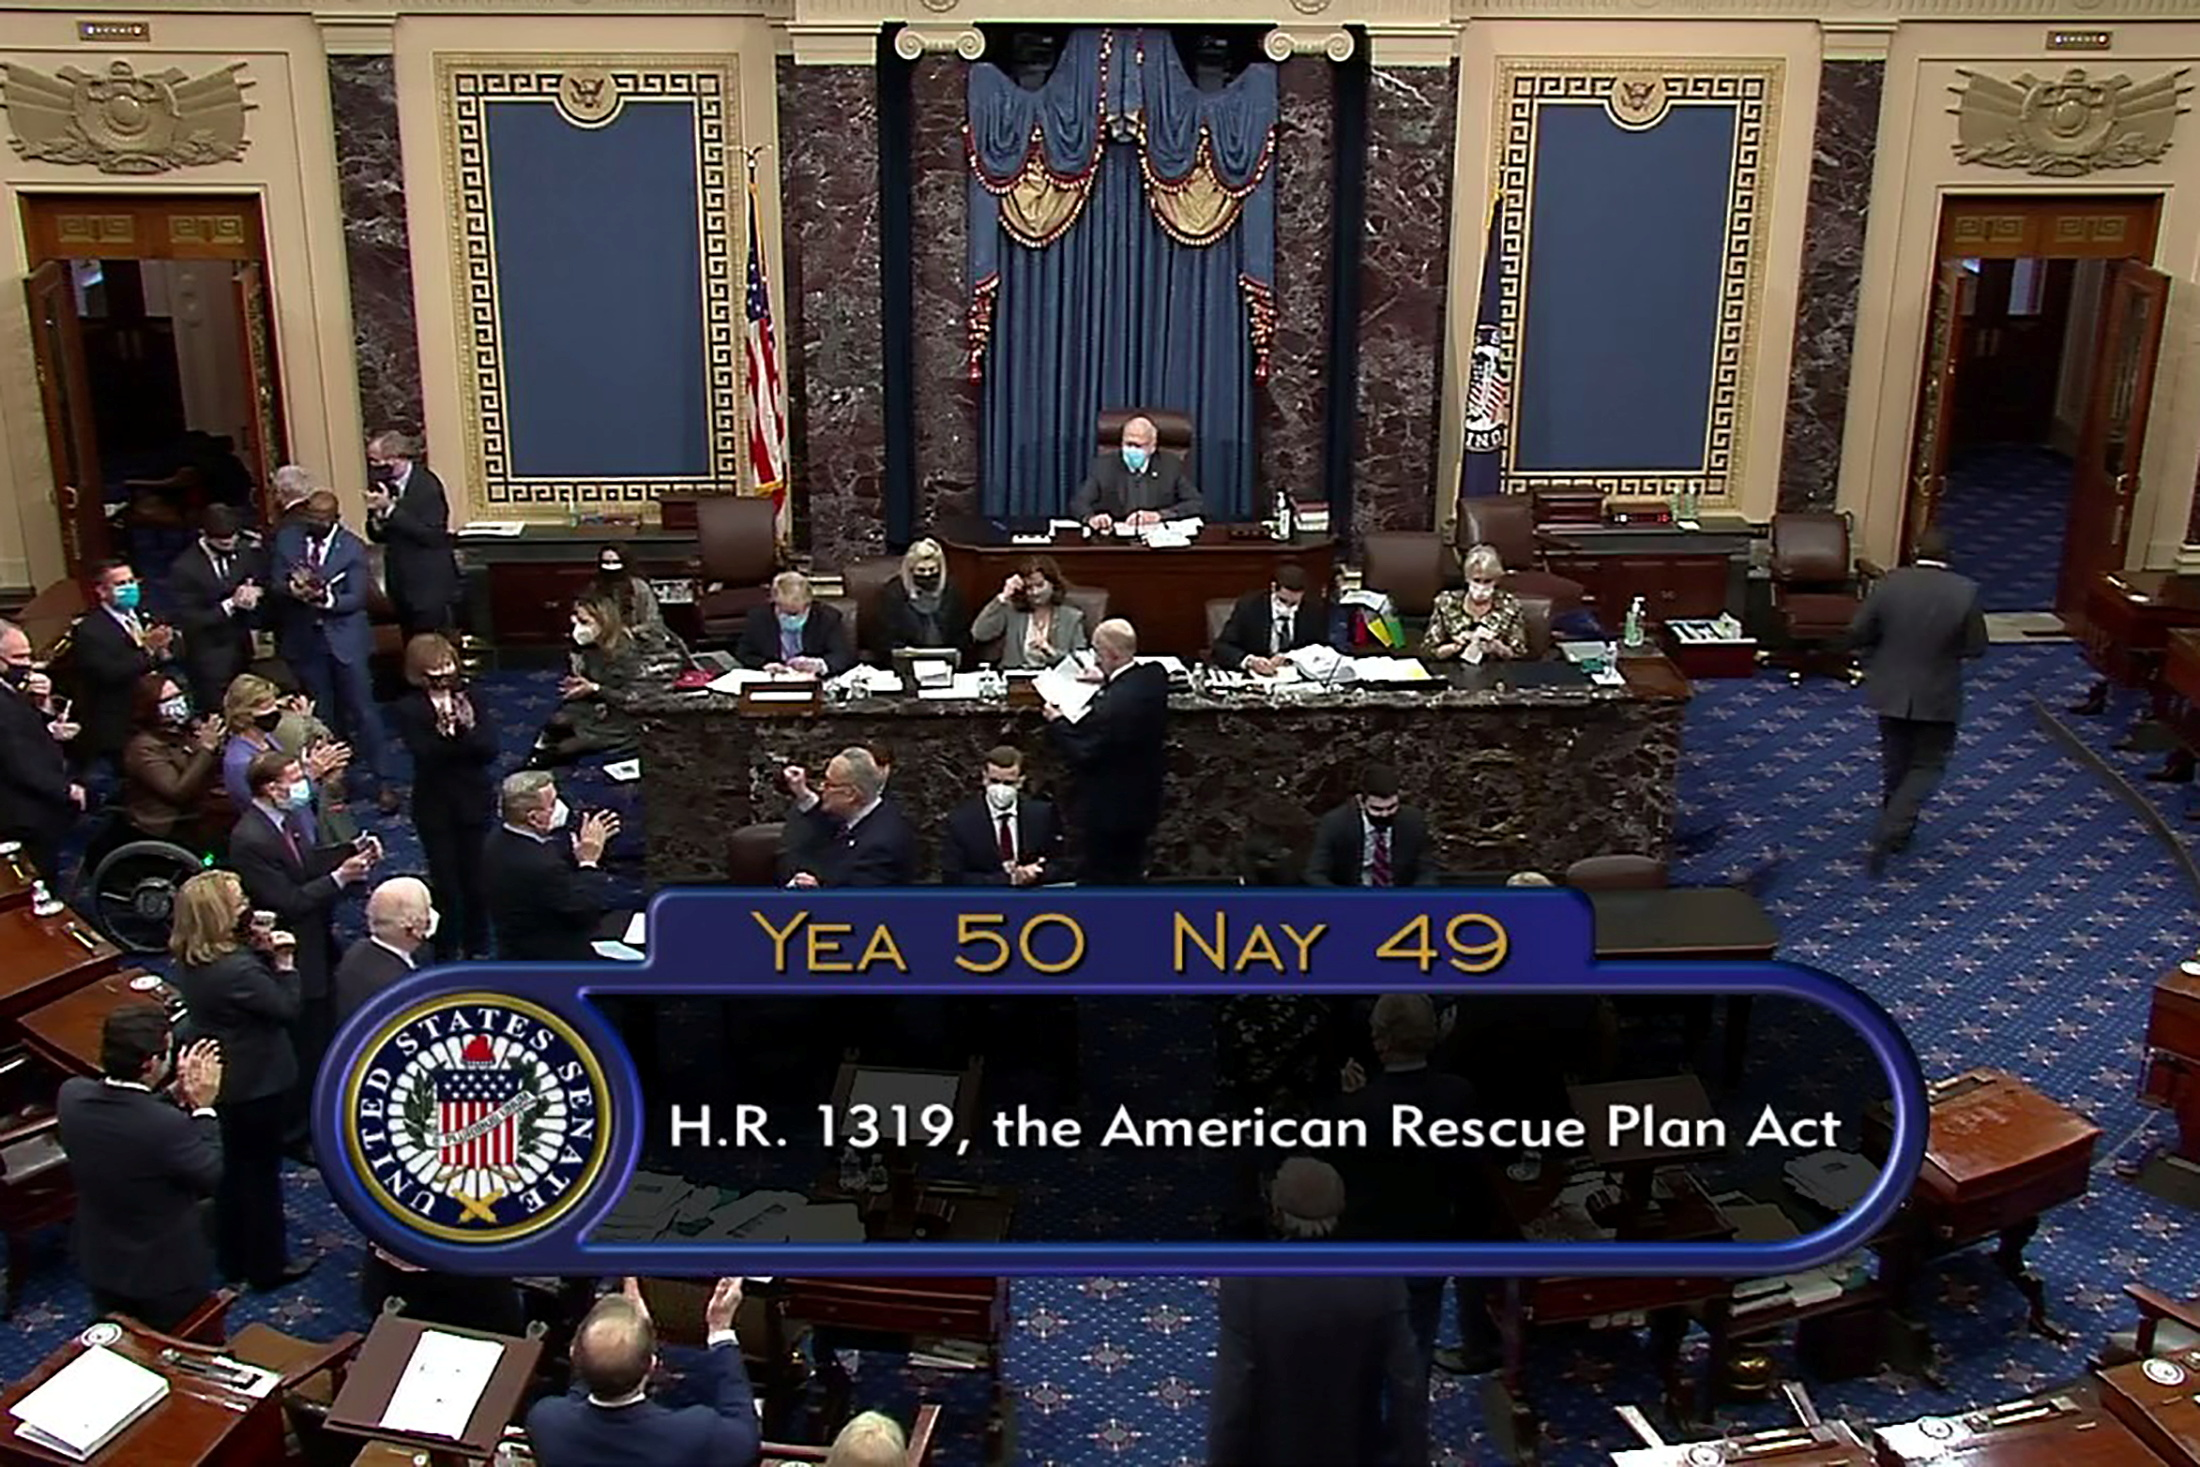 The U.S. Senate passes President Joe Biden's $1.9 trillion COVID-19 relief plan in a party-line vote in Washington, U.S. March 6, 2021 in this still image taken from a video.   Senate TV/REUTERS TV